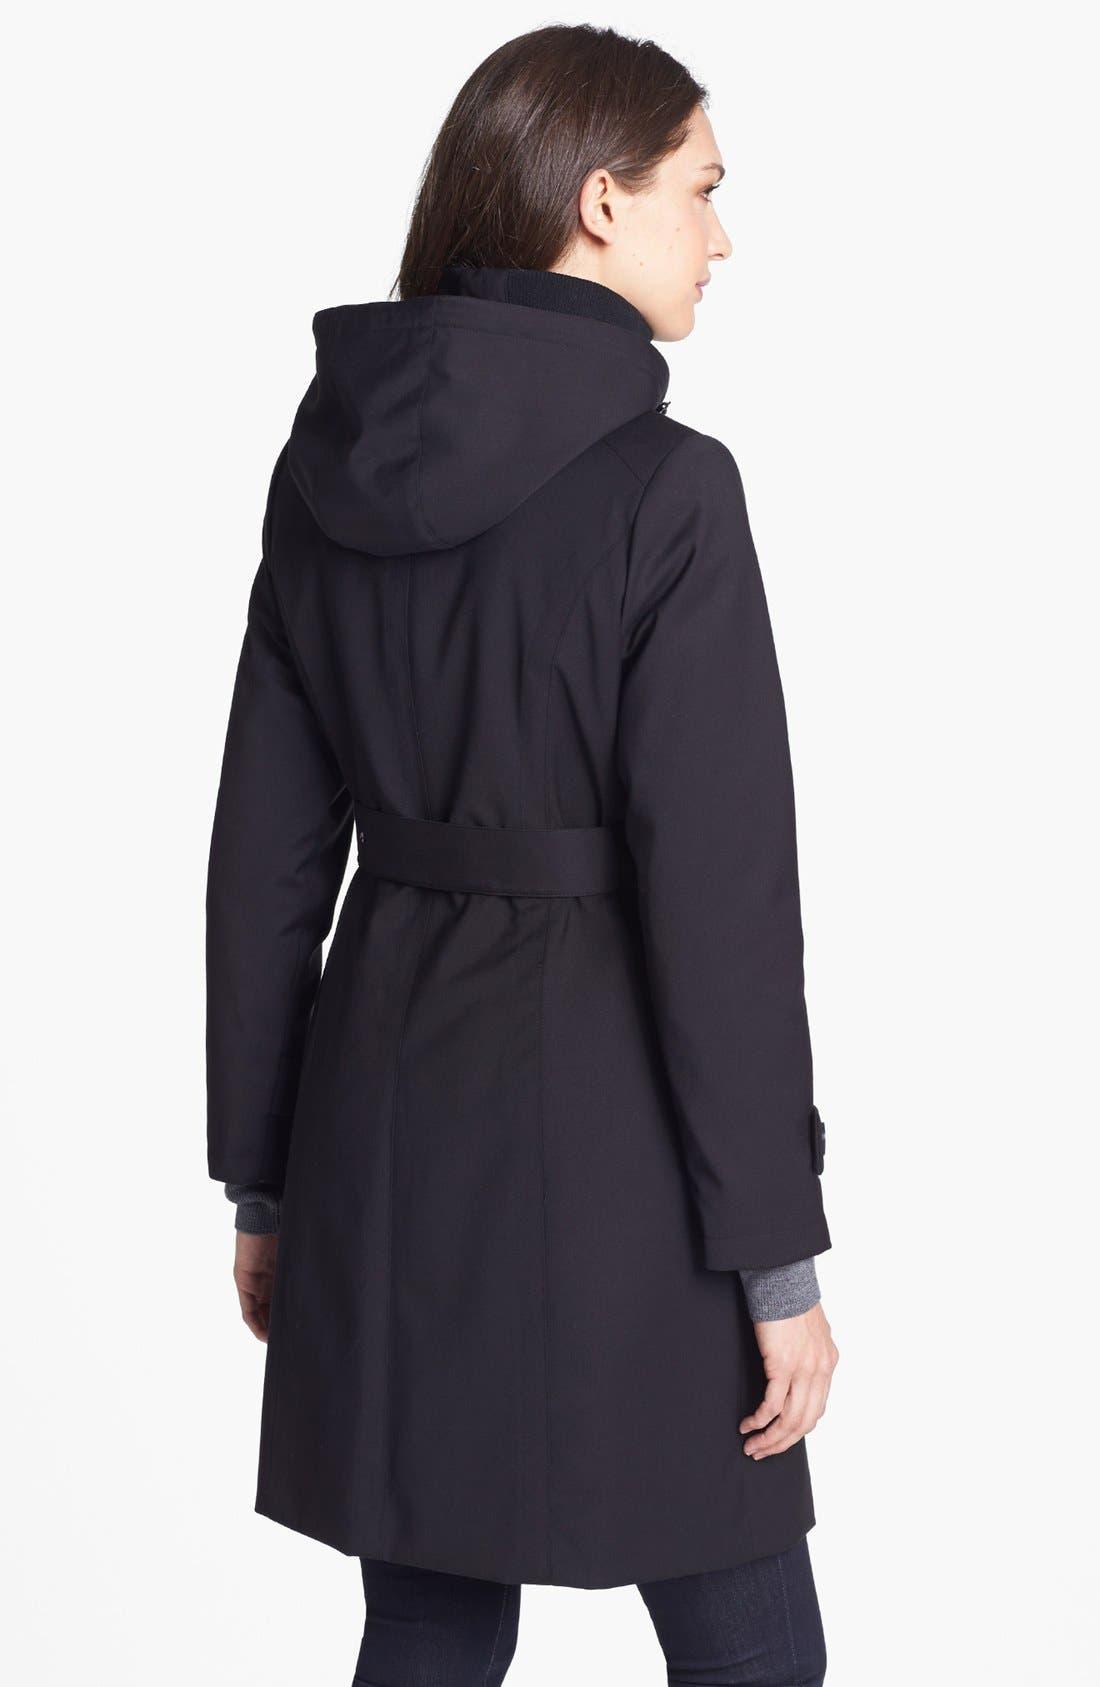 Alternate Image 3  - Kristen Blake Raincoat with Detachable Hood & Liner (Petite) (Nordstrom Exclusive)